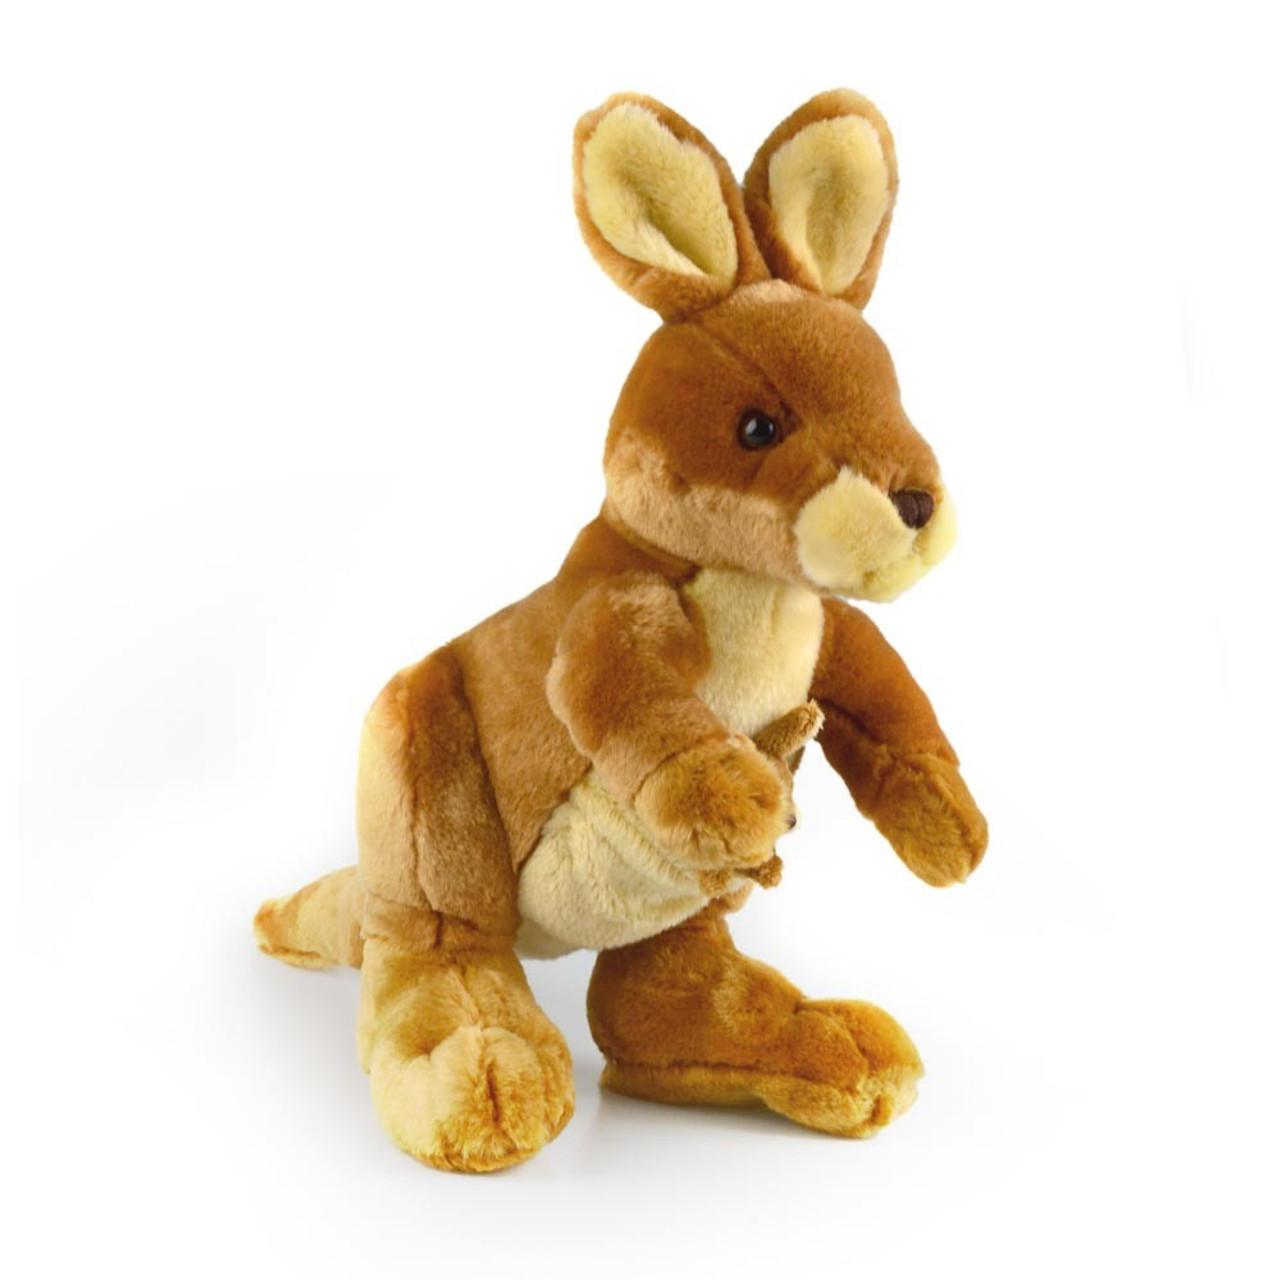 Korimco 35cm Kids//Children Large Gigio Giraffe Plush Soft Animal Stuffed Toy